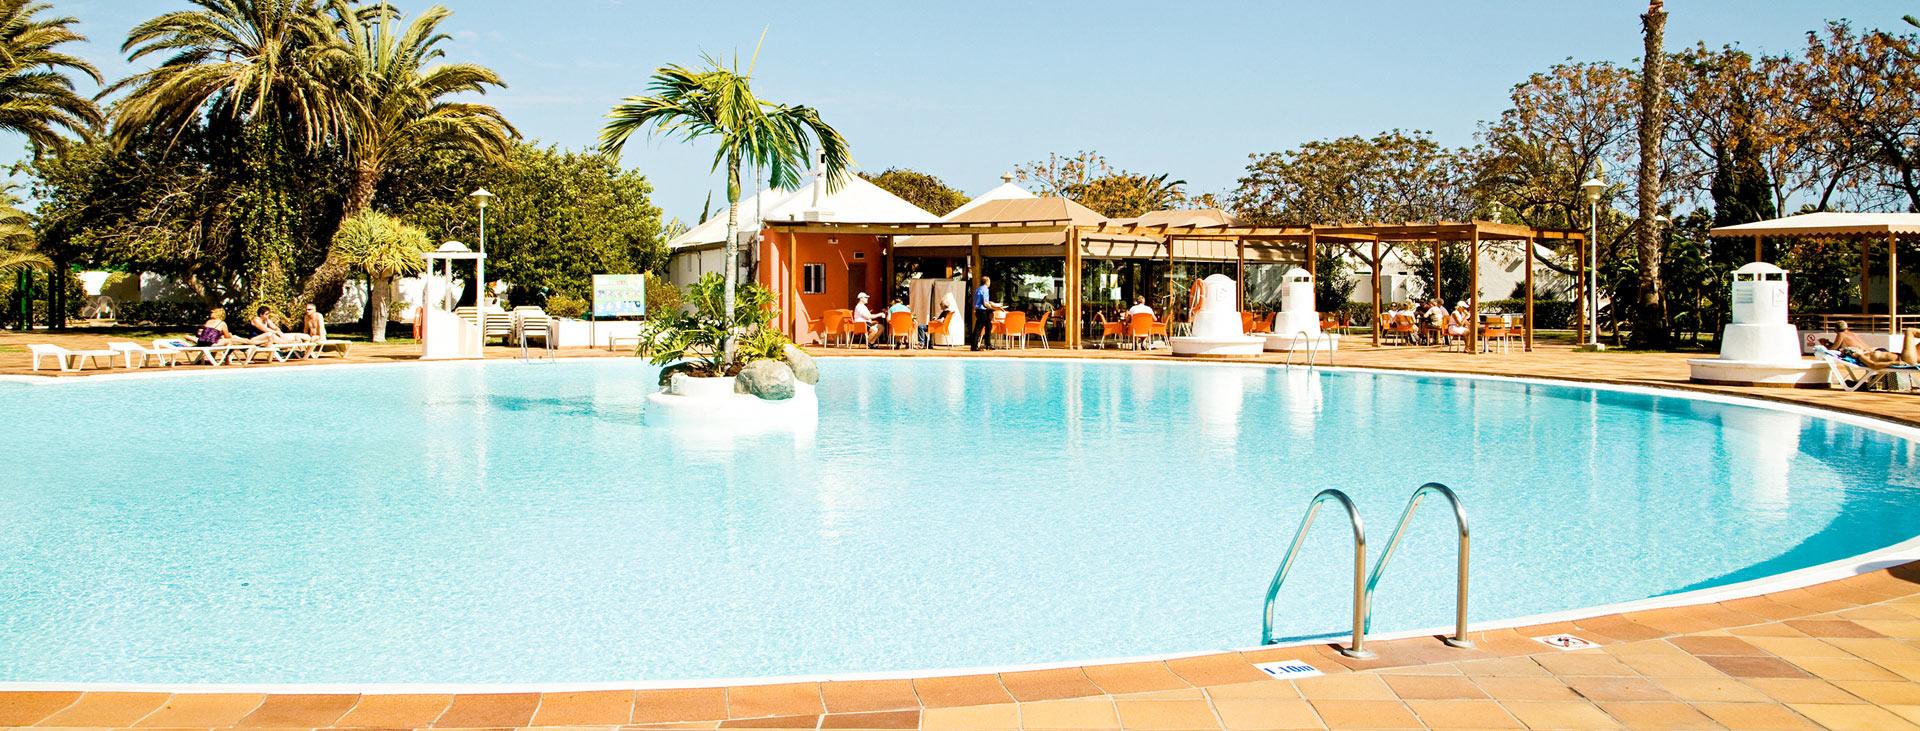 Cordial Sandy Golf, Maspalomas, Gran Canaria, Kanariansaaret